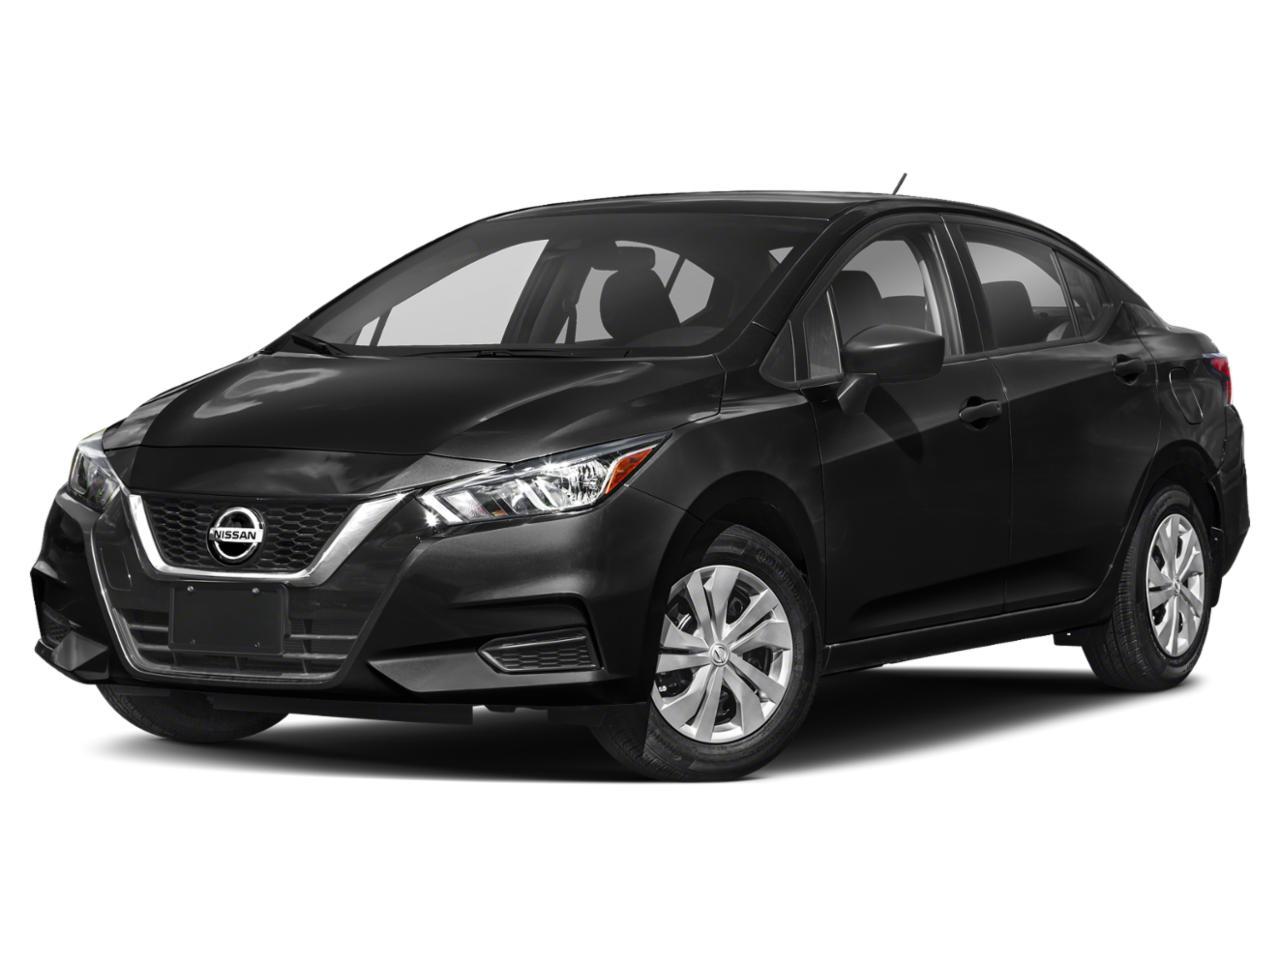 2021 Nissan Versa Vehicle Photo in Surprise, AZ 85388